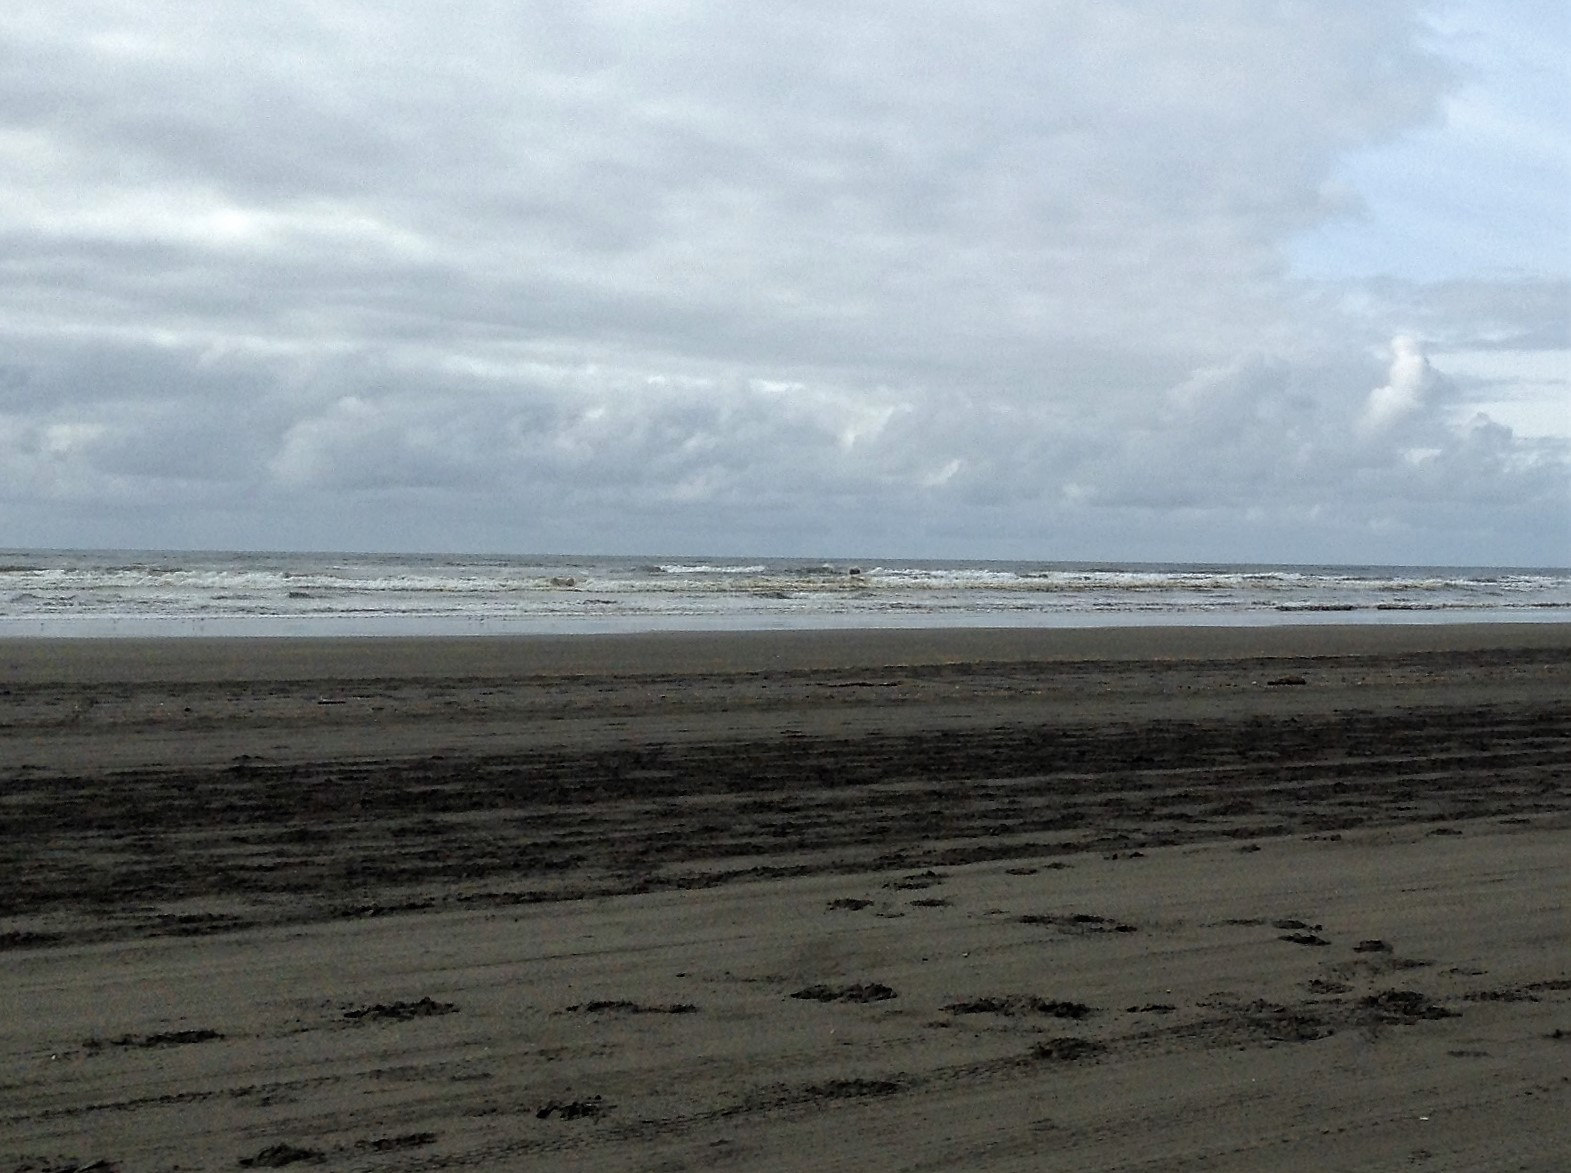 Beach Scene Waves Oceans Shores, WA #graysharborbeaches